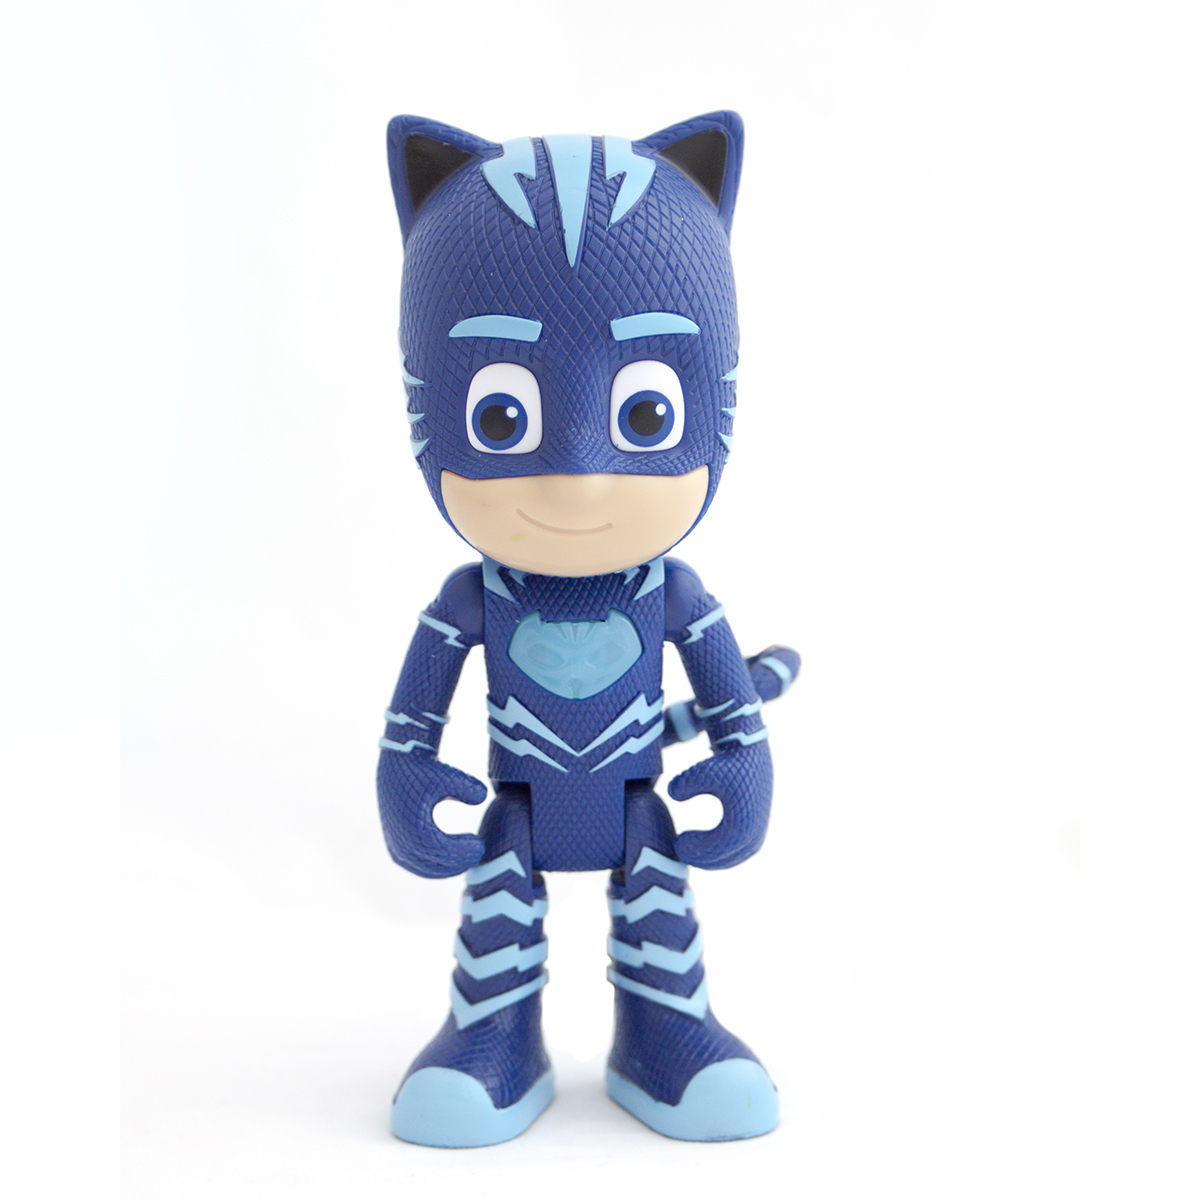 Фигурка PJ Masks PJ Masks «Кэтбой» со звуком 15 см фигурка pj masks алетт 8 см